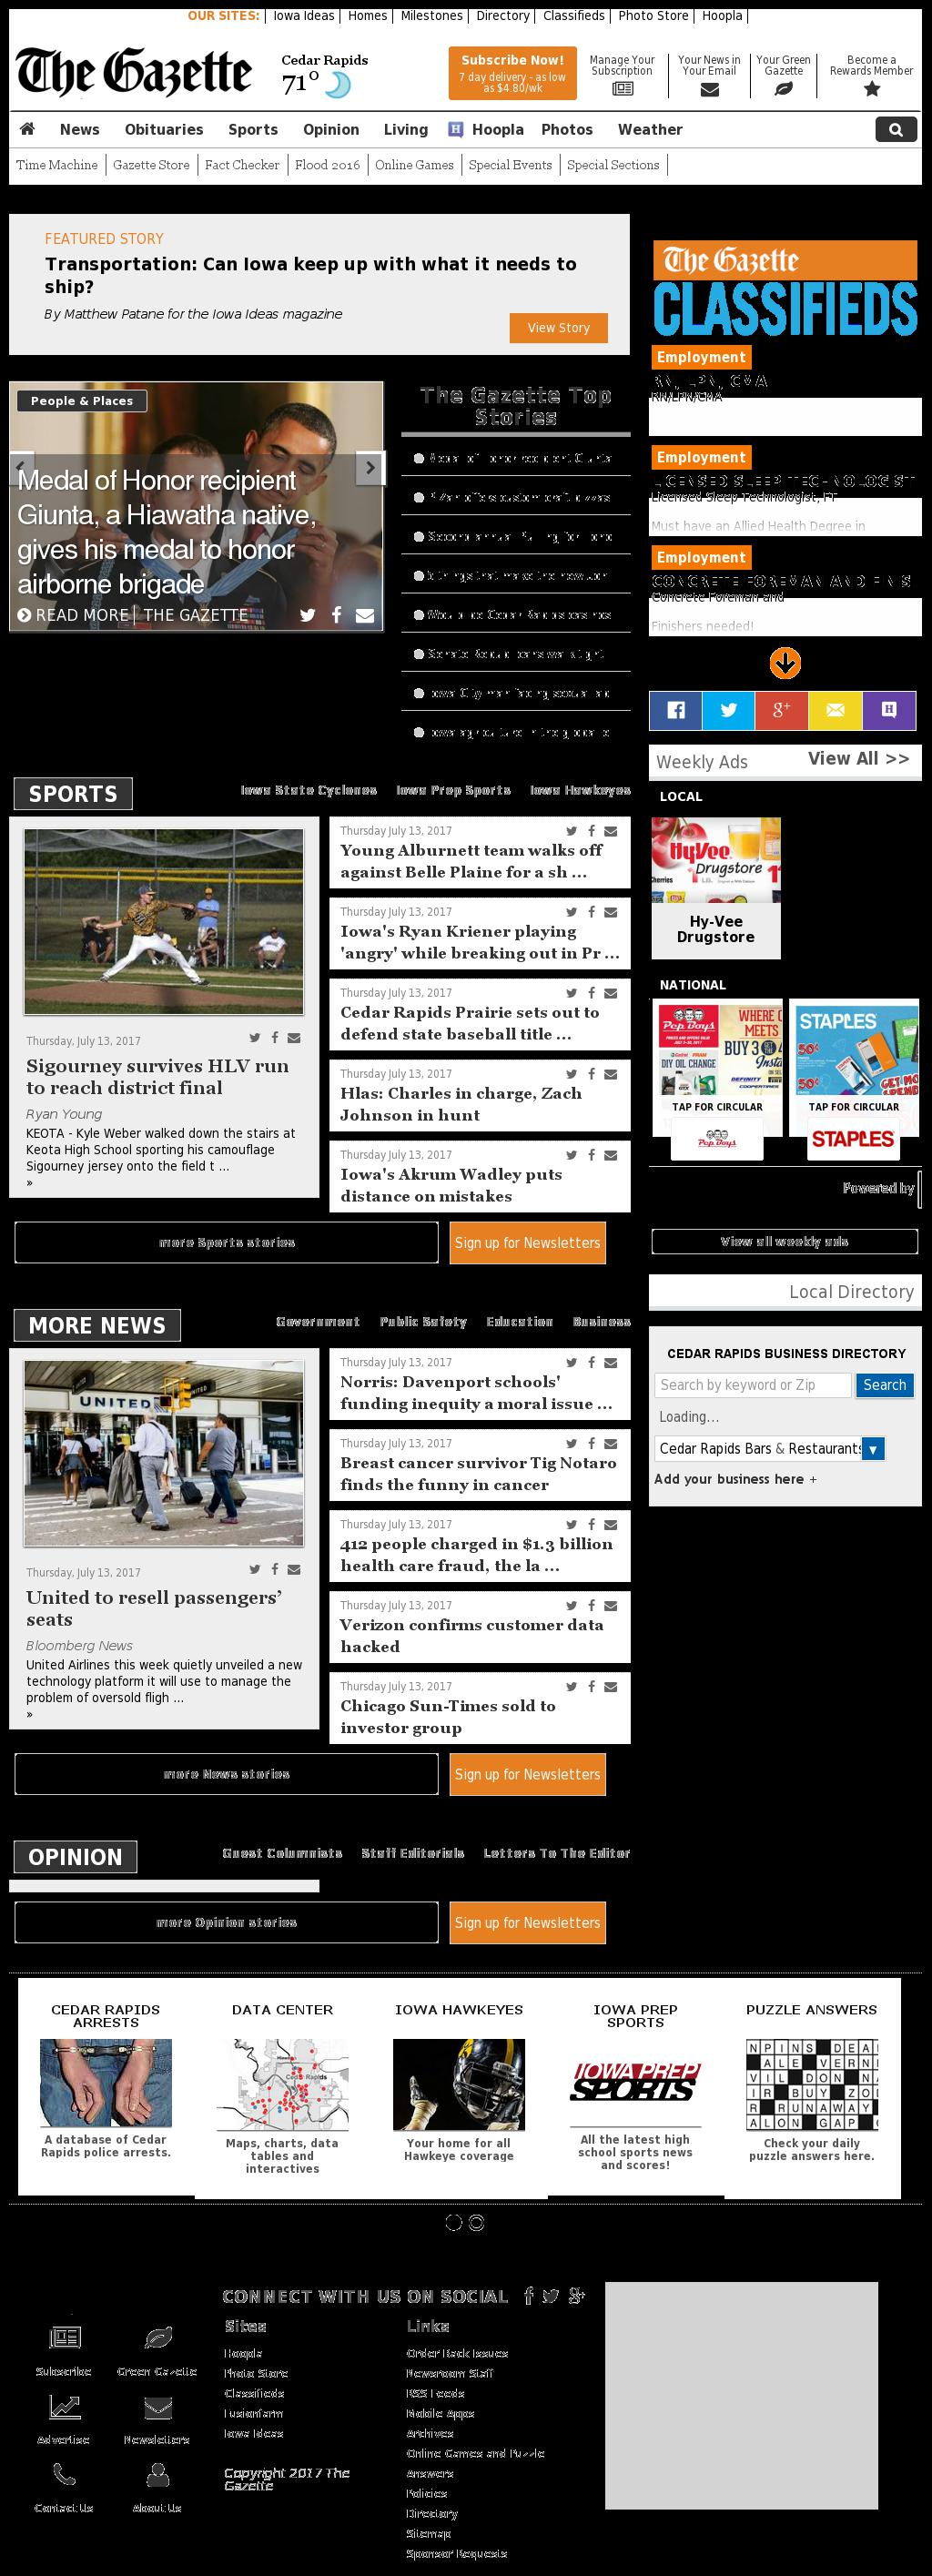 The (Cedar Rapids) Gazette at Friday July 14, 2017, 4:05 a.m. UTC